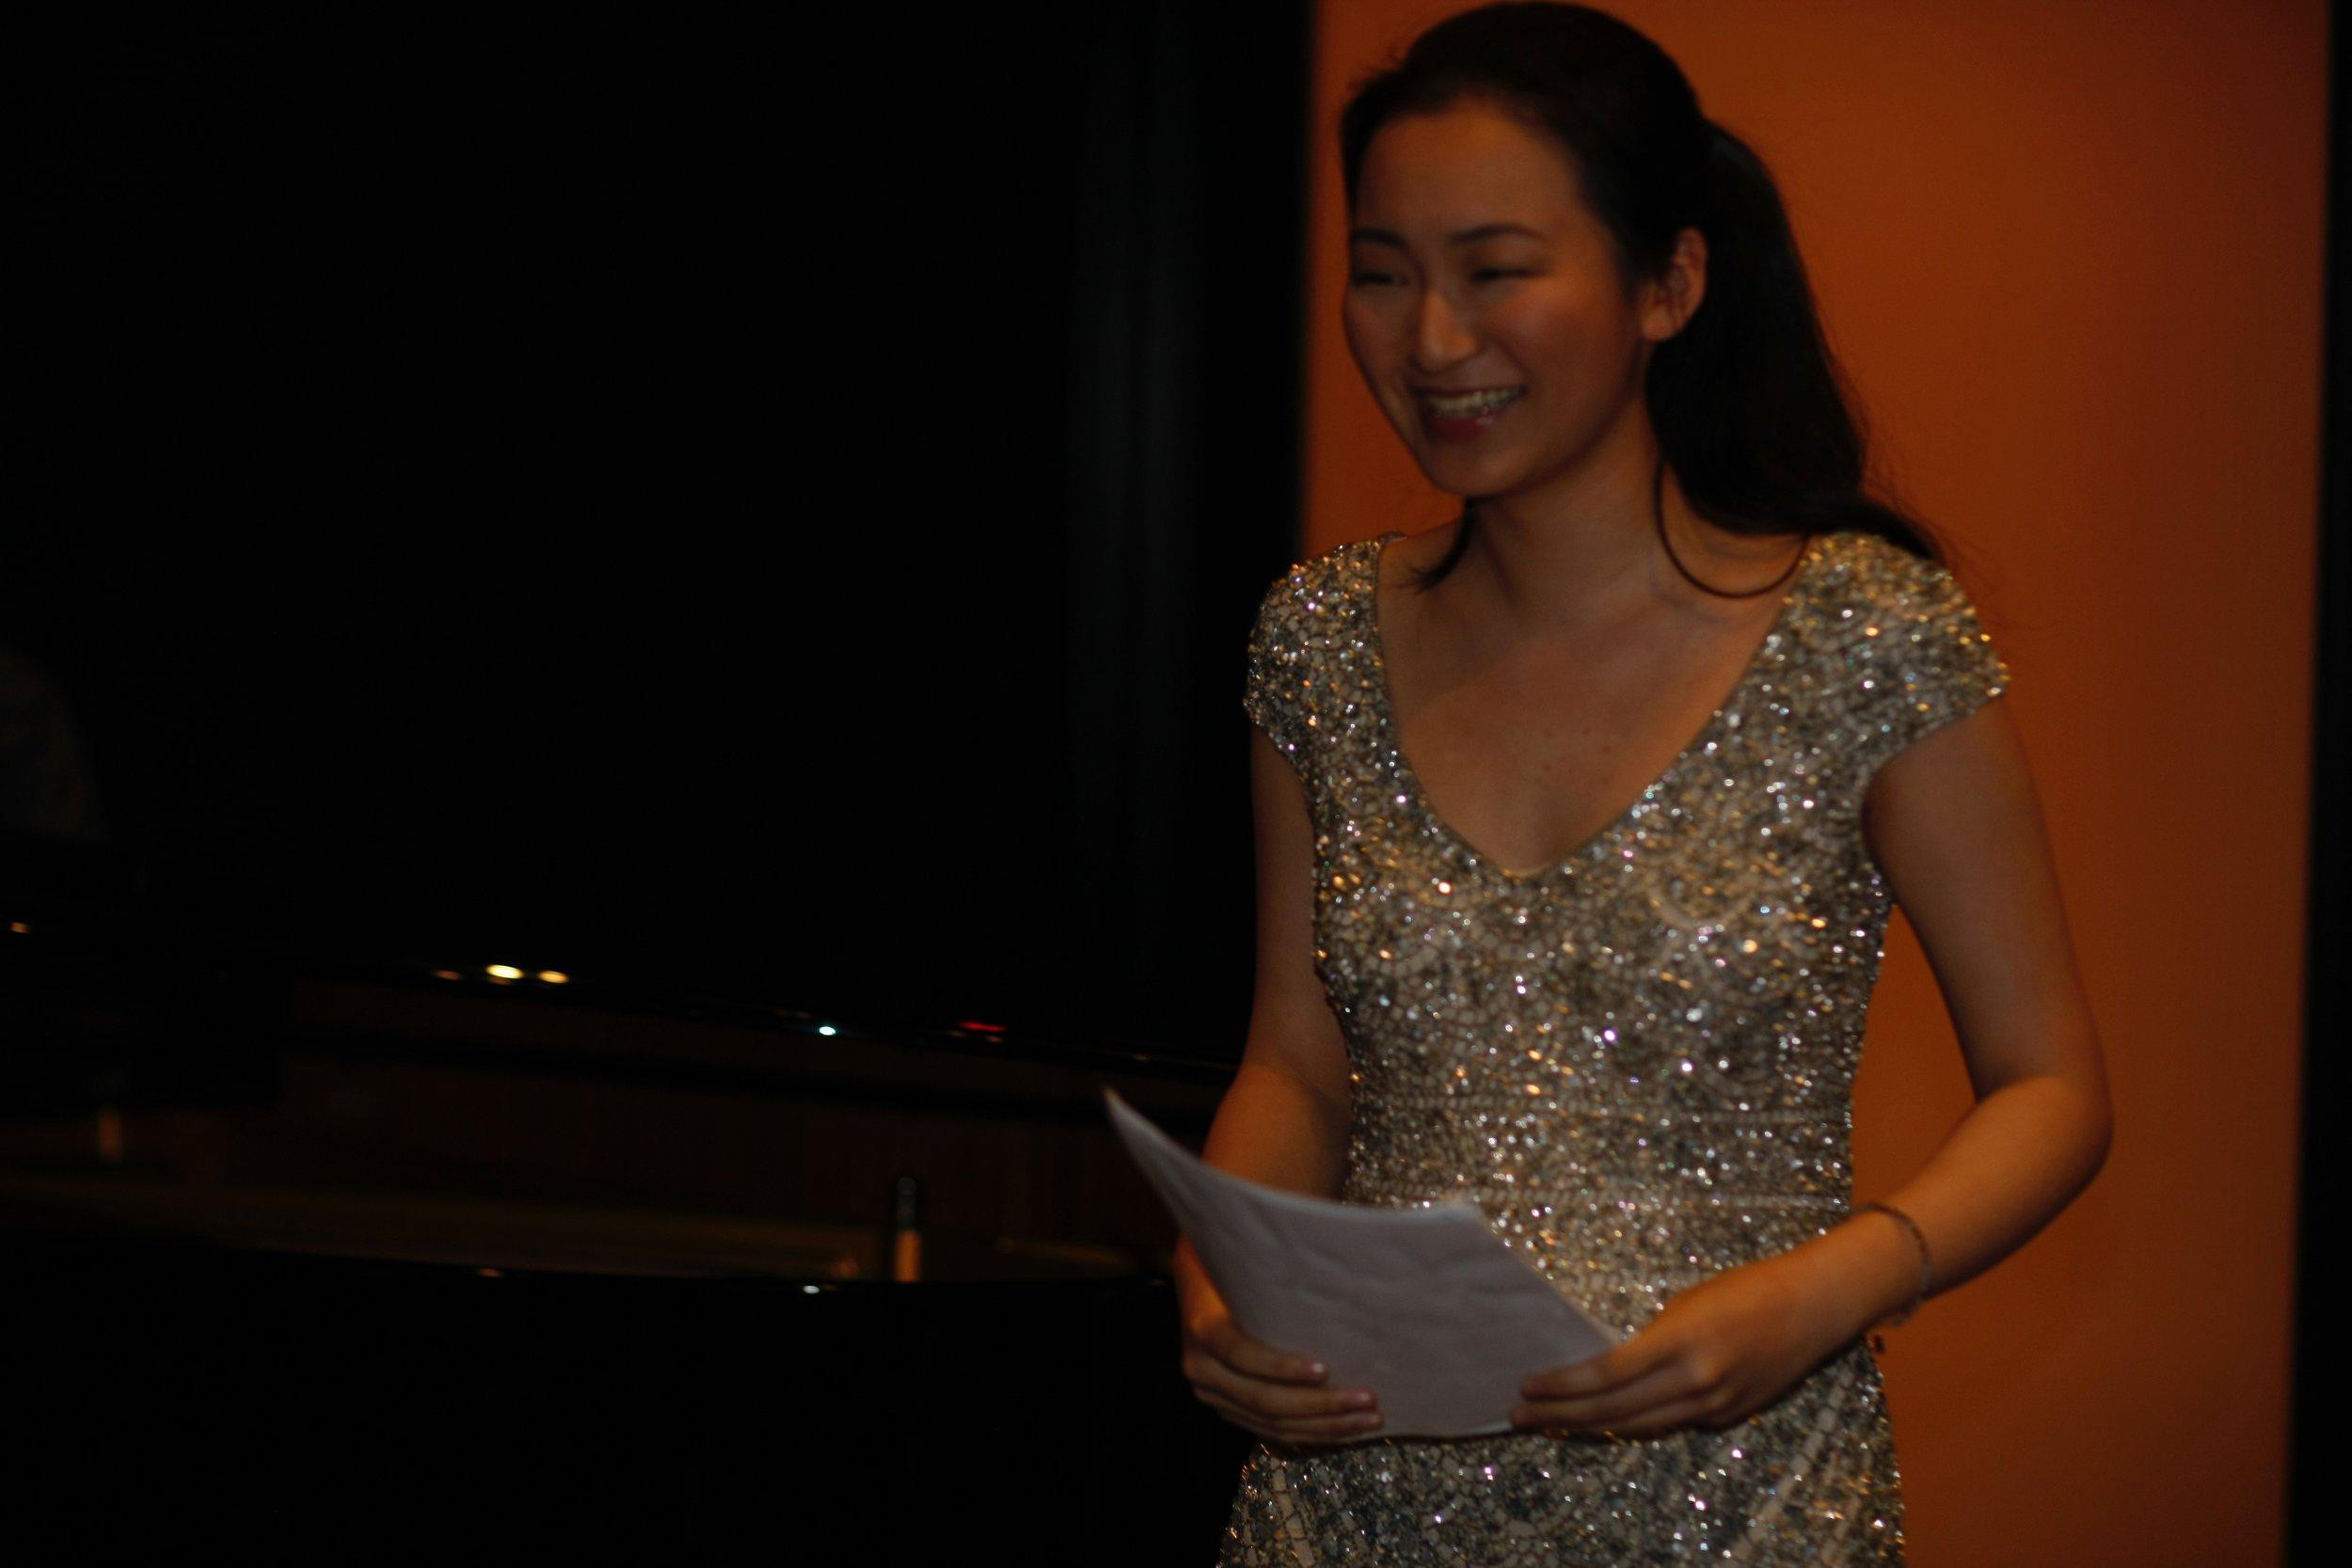 Guest Artist AF Fellow, Chelsea Guo